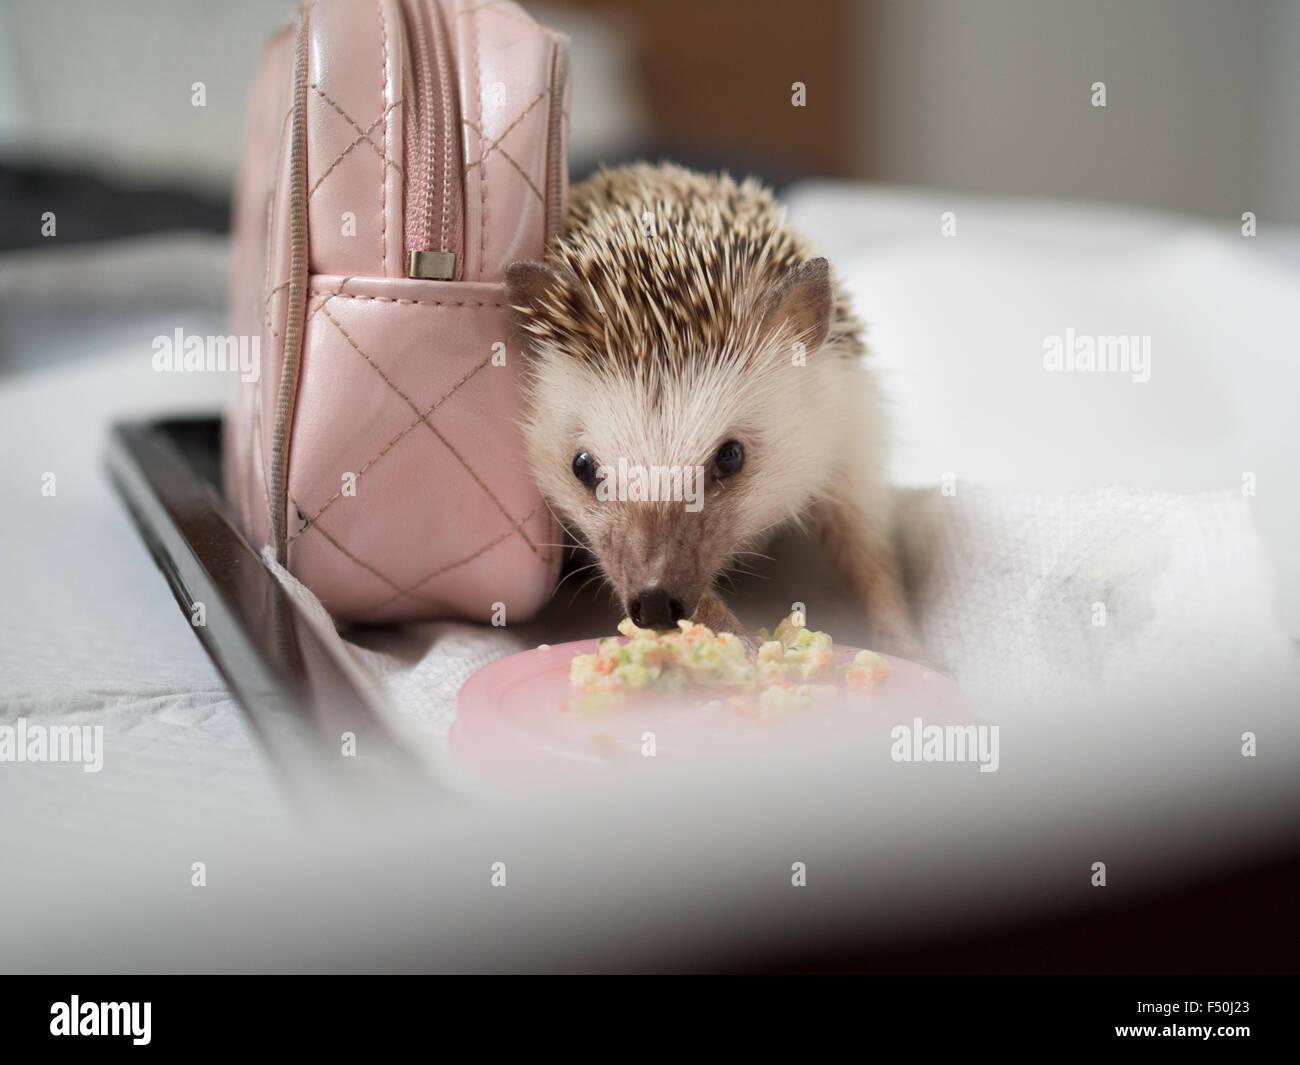 A hedgehog eats mixed veggies - Stock Image